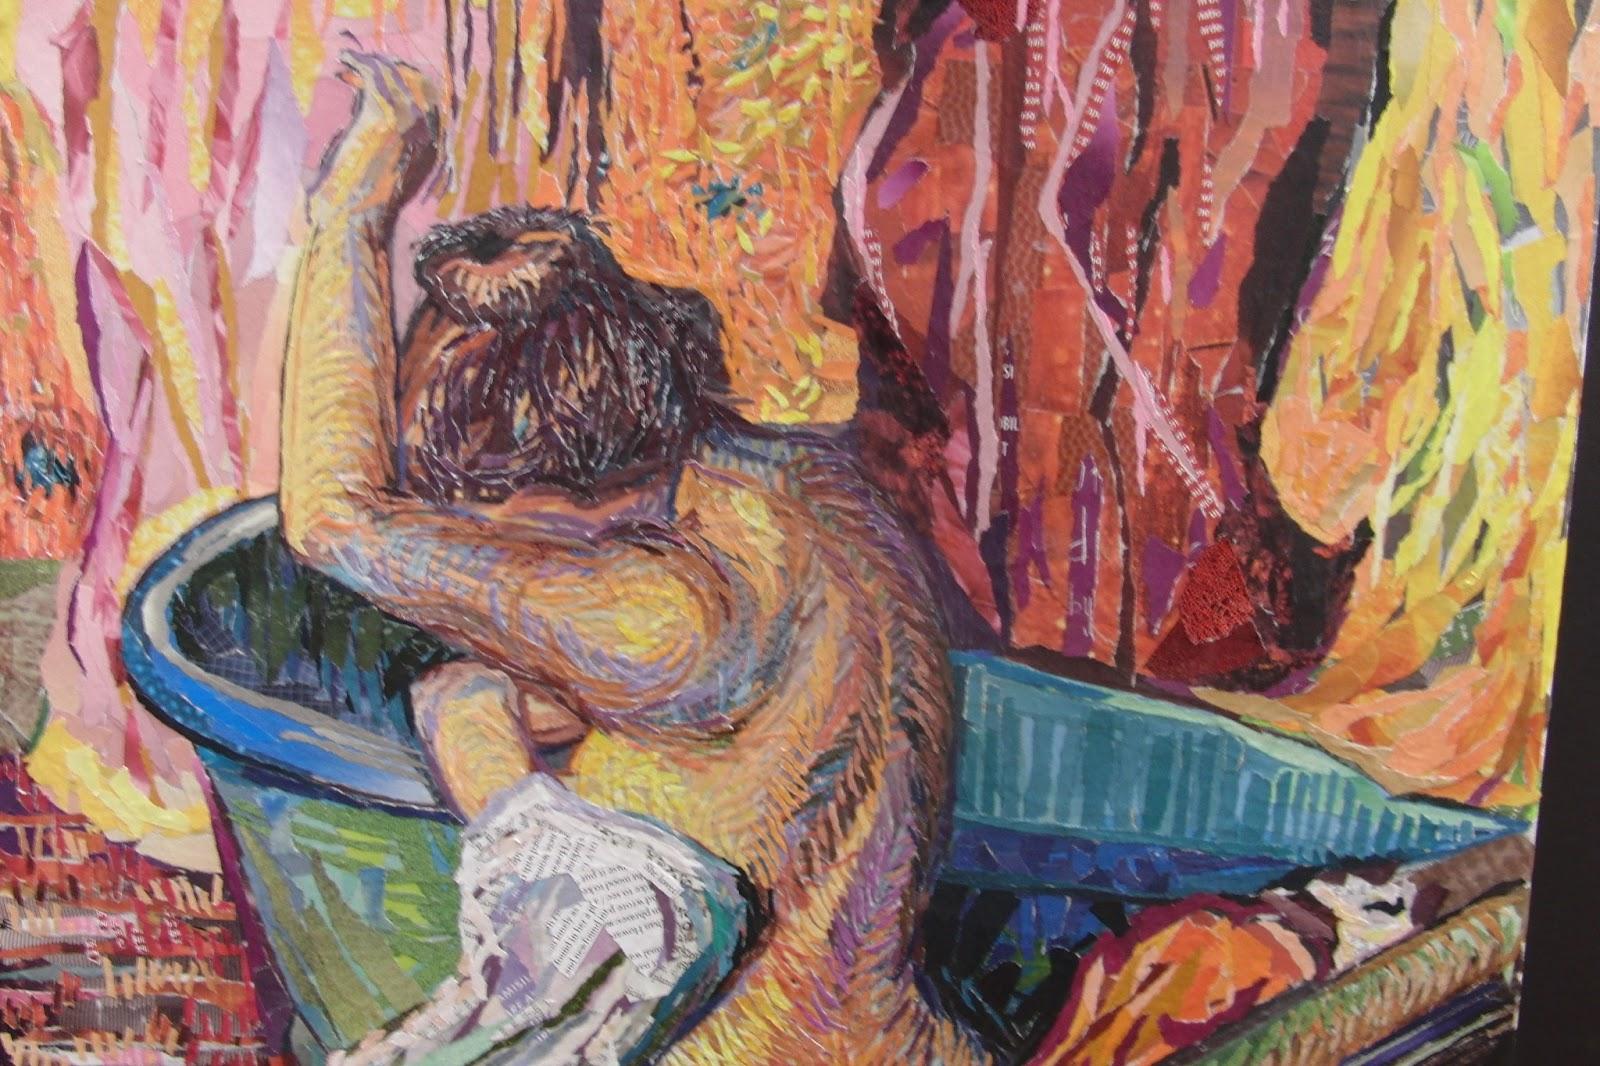 http://3.bp.blogspot.com/-v-vYEURI-mQ/UPmPANWTQNI/AAAAAAAAAe0/wn8Ec7uoVWY/s1600/Torn+Paper+Art+Closeup+Bather+Study1.jpg